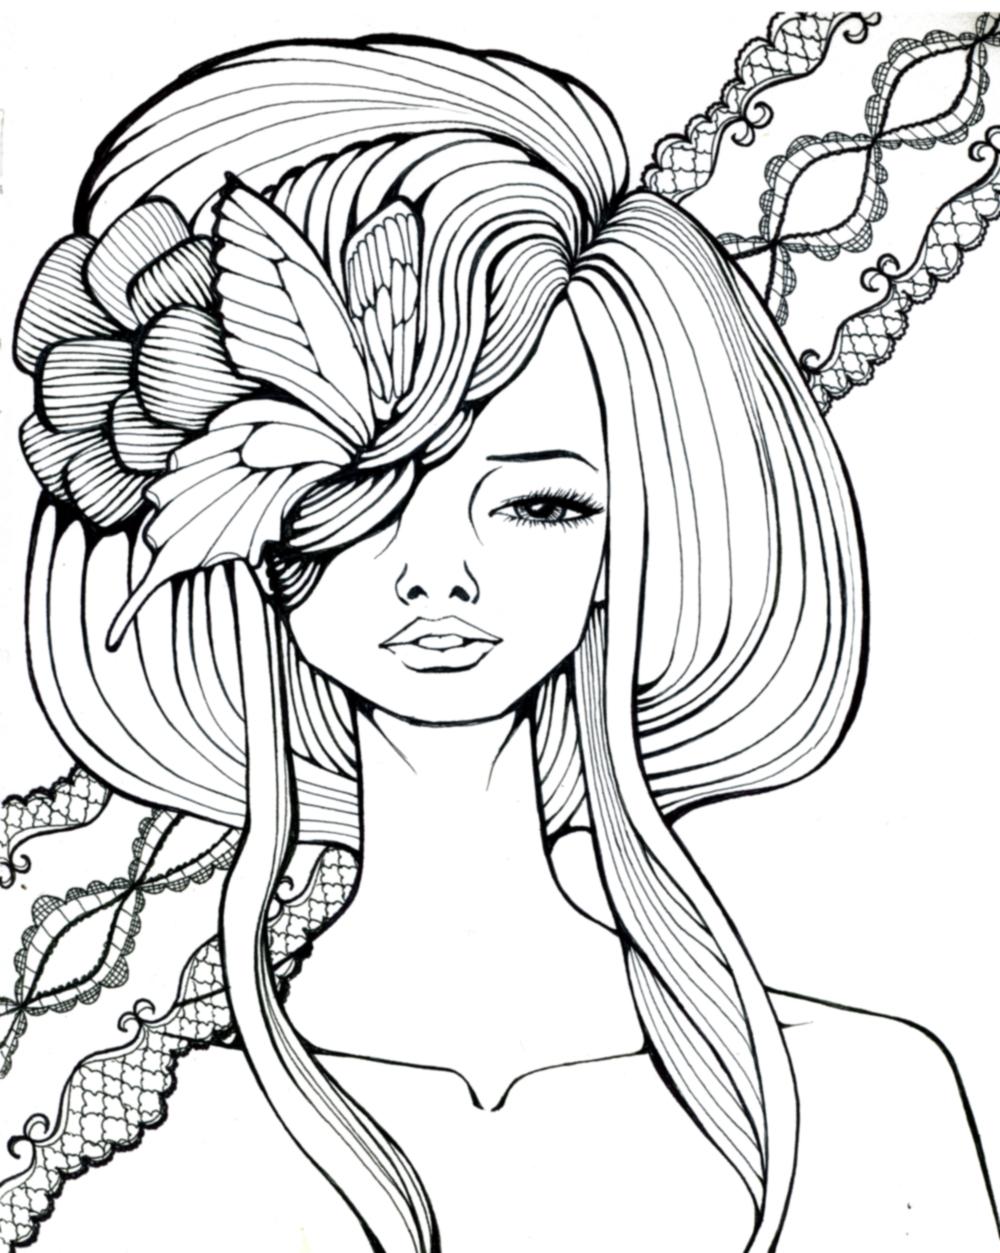 drawing004.jpg